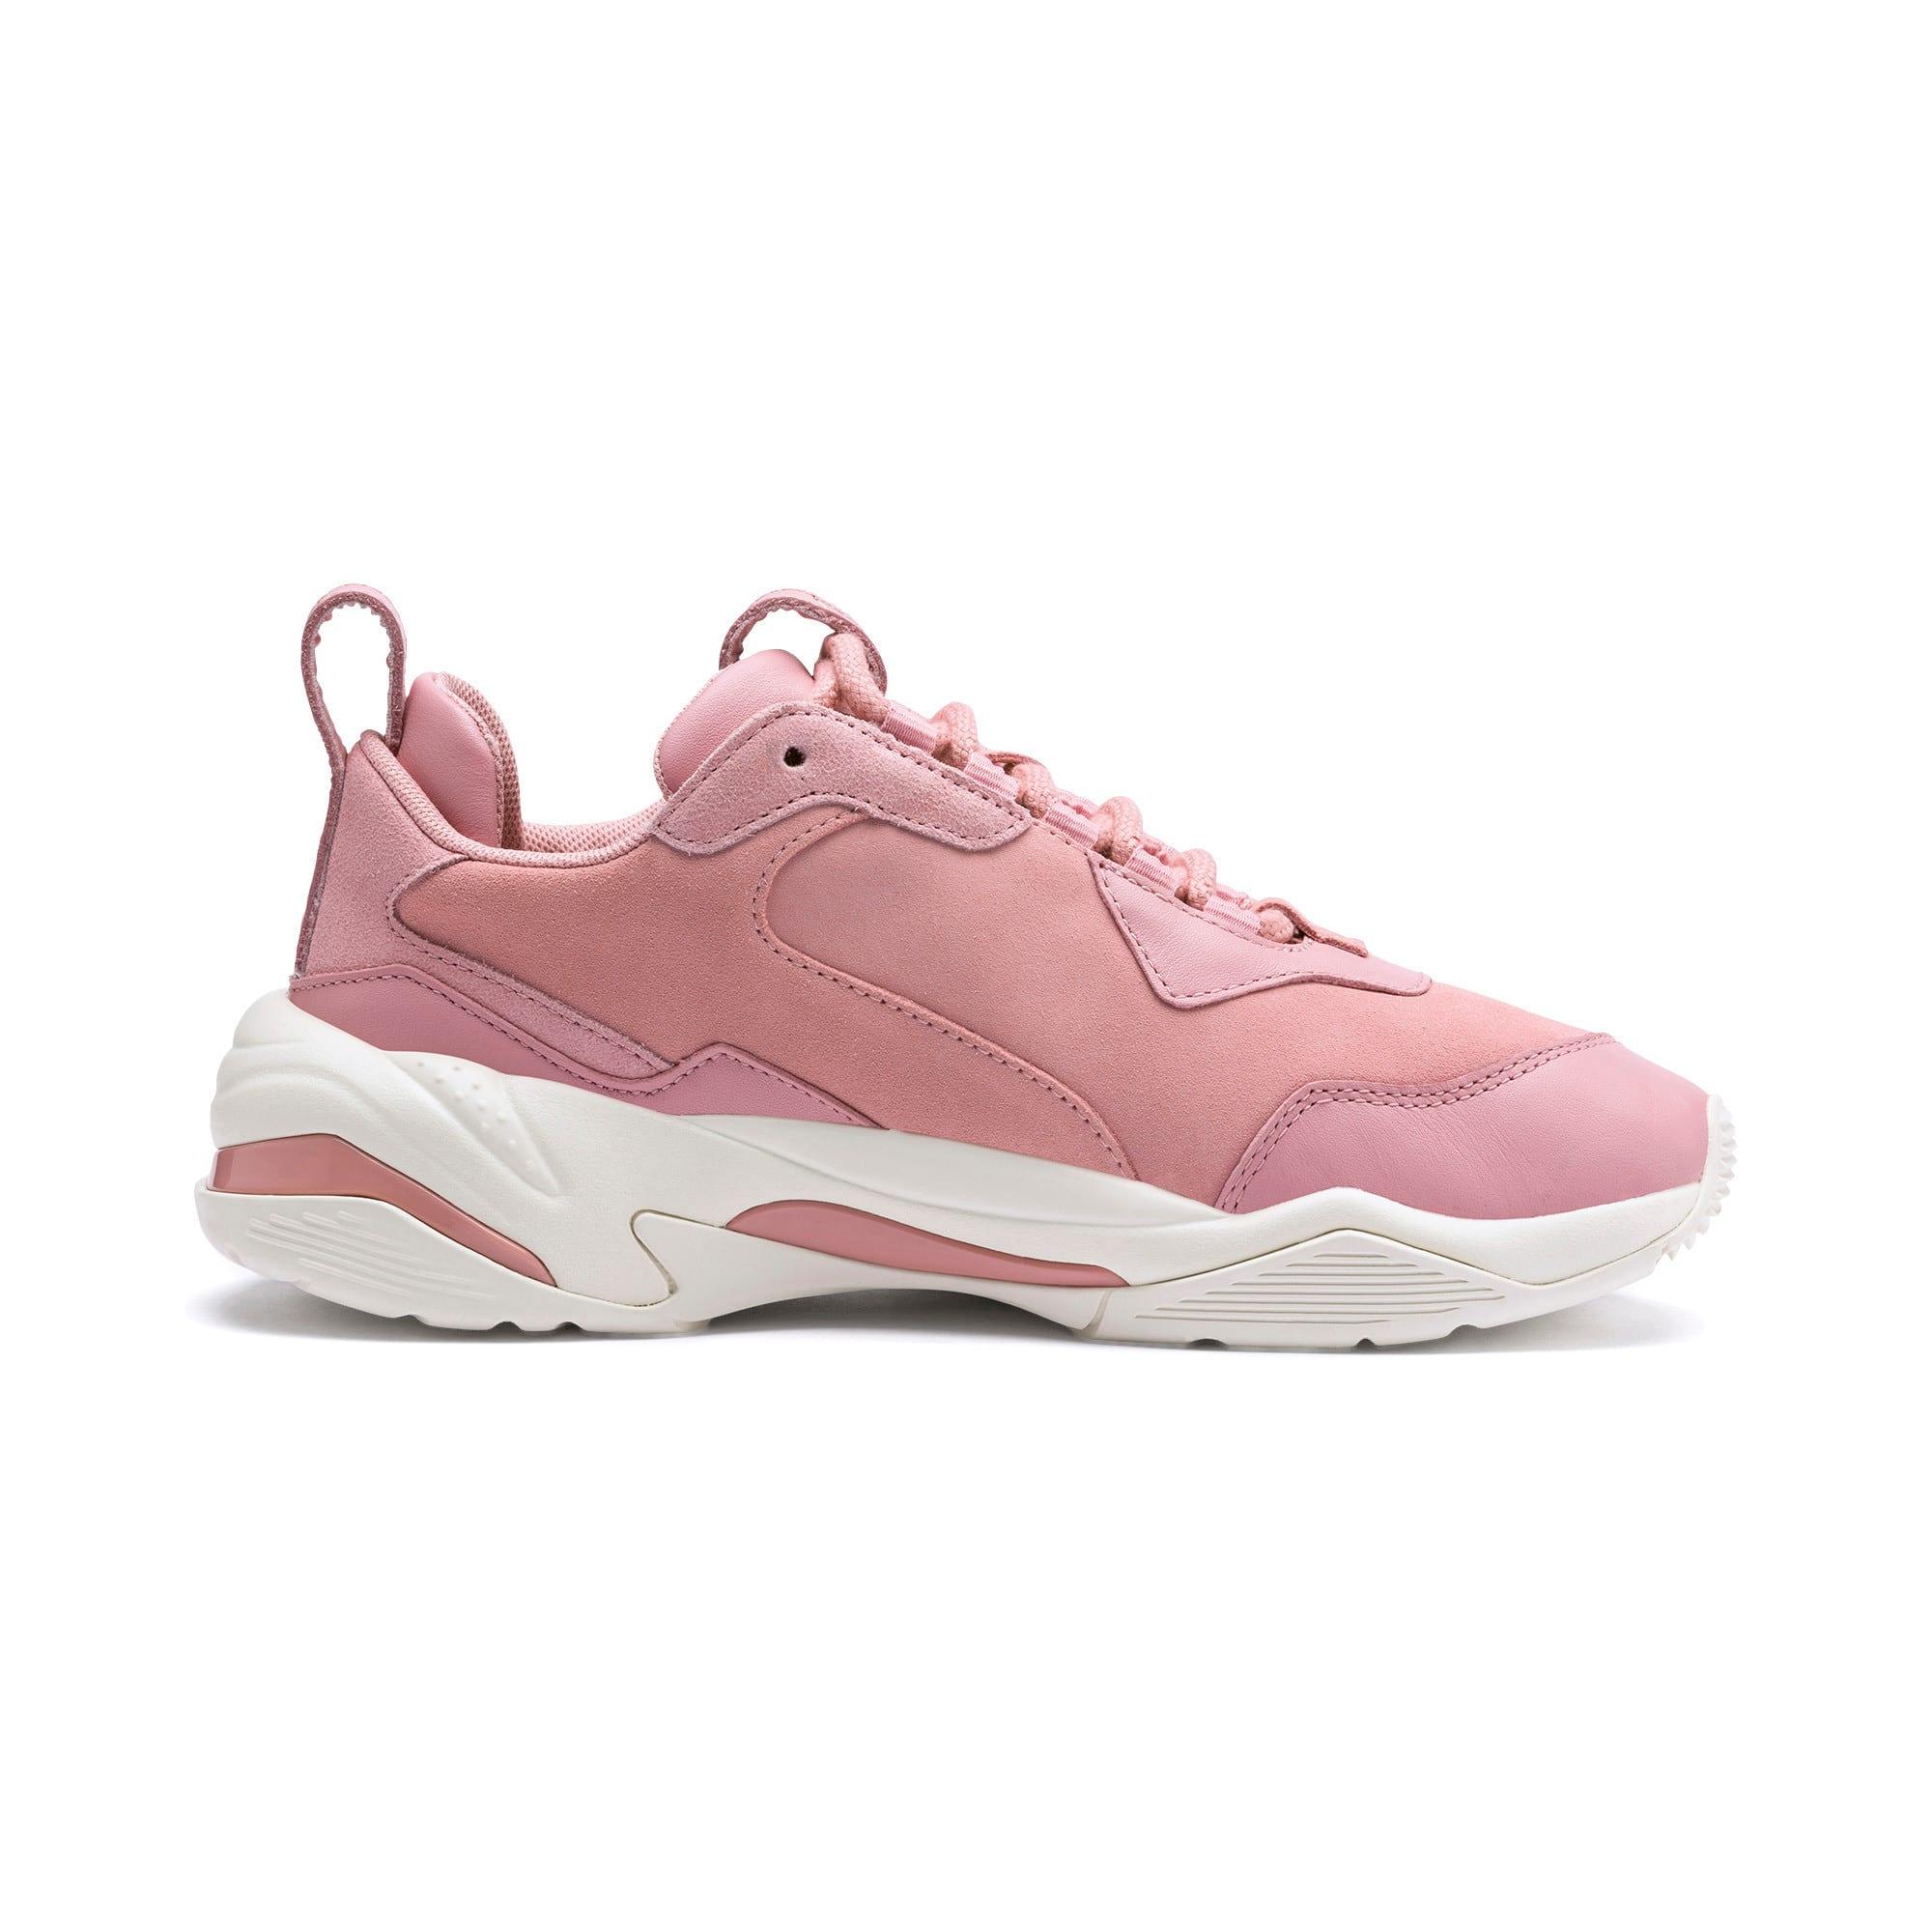 Thumbnail 6 of Thunder Fire Rose Women's Sneakers, Bridal Rose-Puma Team Gold, medium